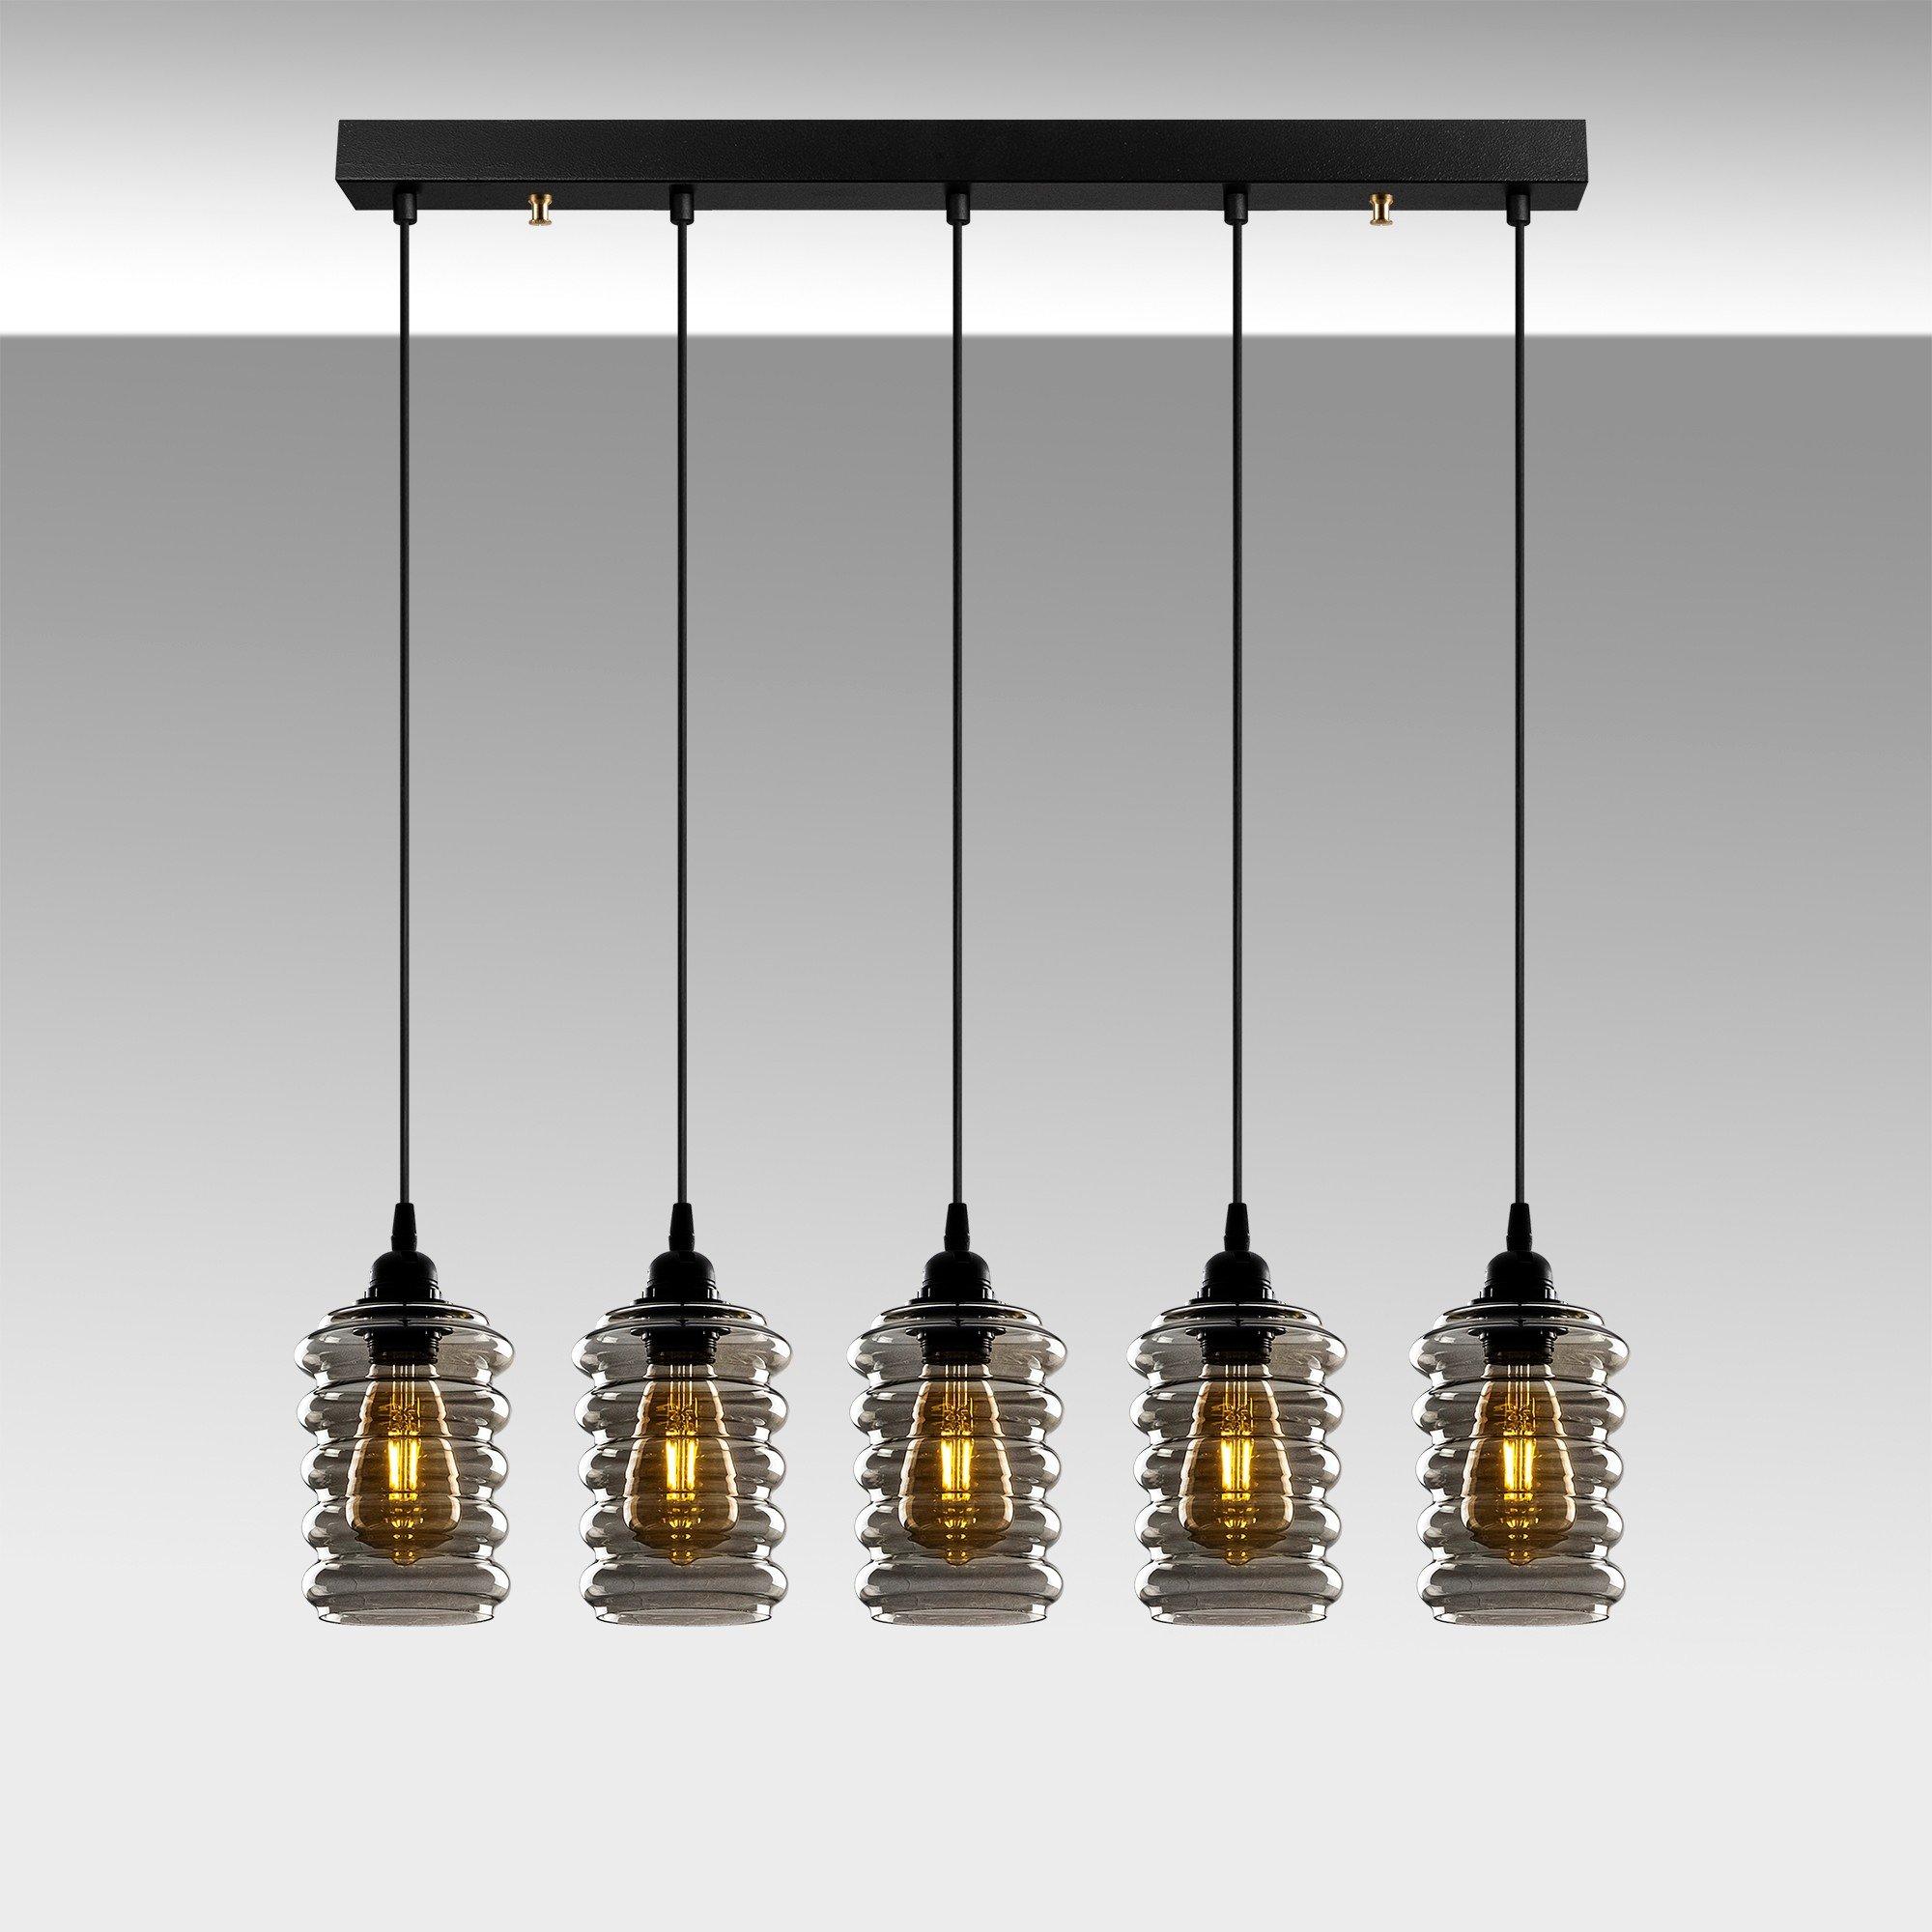 Hanglamp smoked glass 5 x E27 fitting - sfeerfoto